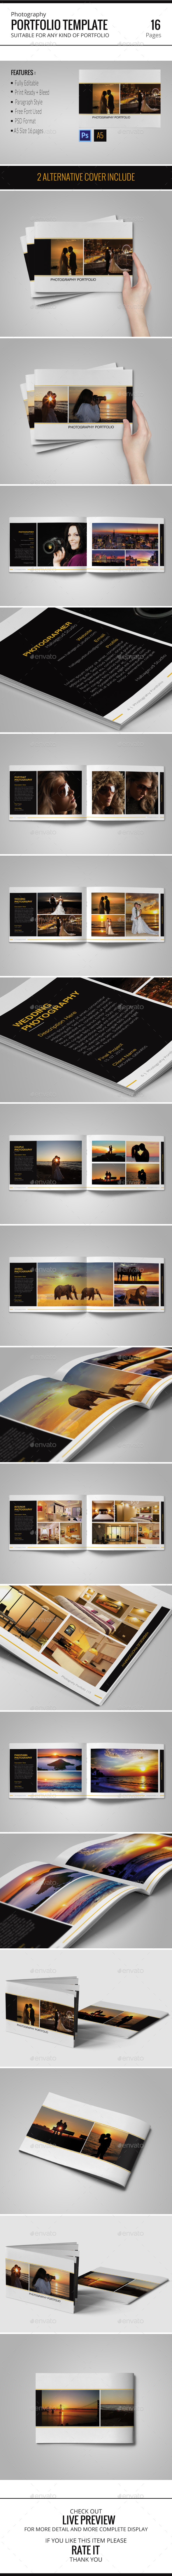 Photography Portfolio Template - Portfolio Brochures